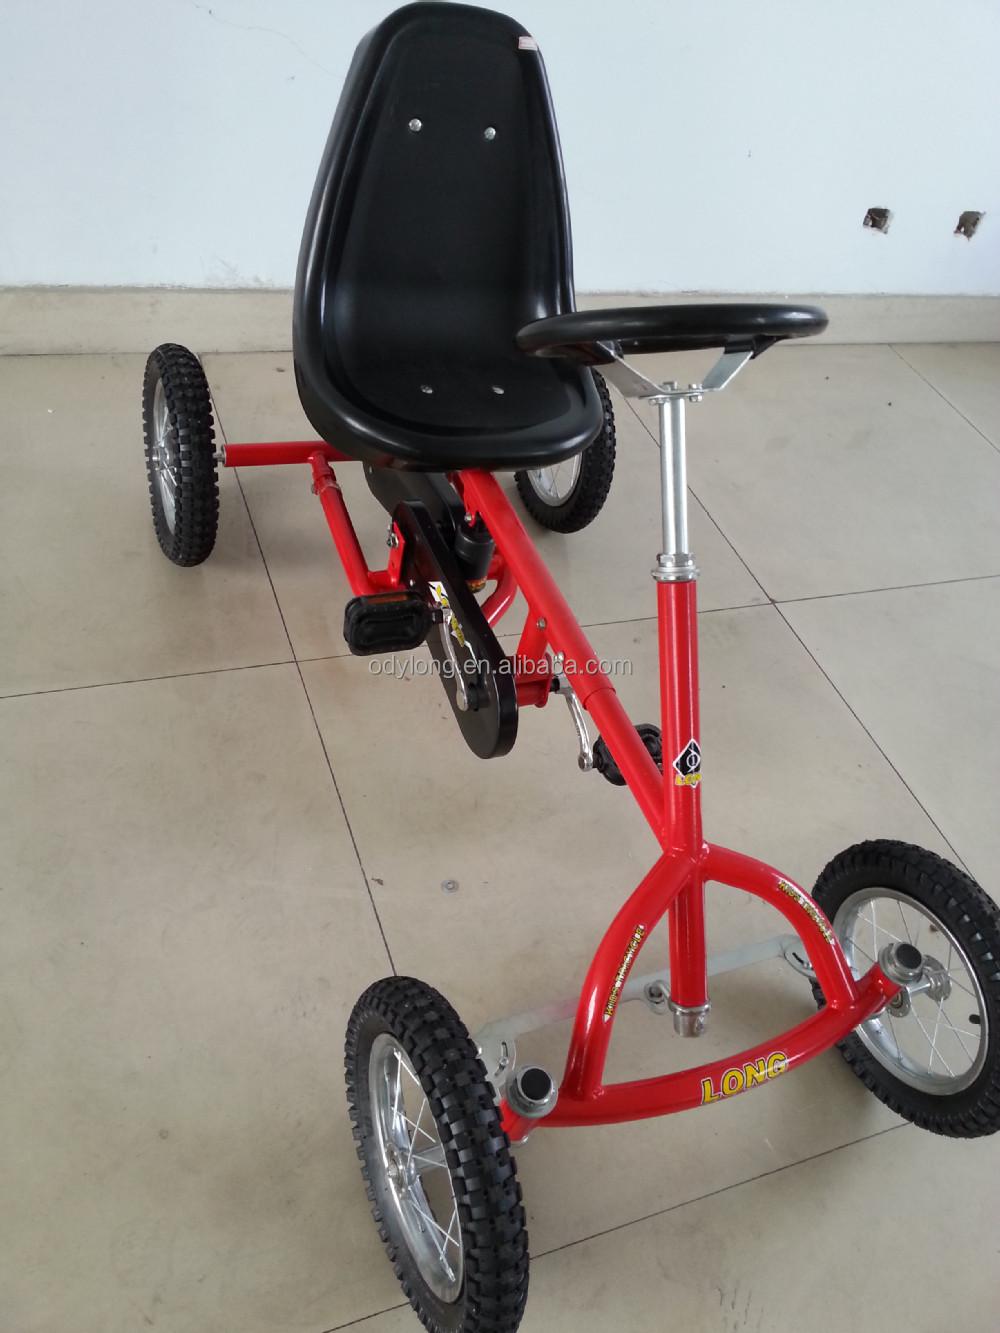 Cheap Racing Go Kart For Sale Adult Pedal Car Gokart Kart